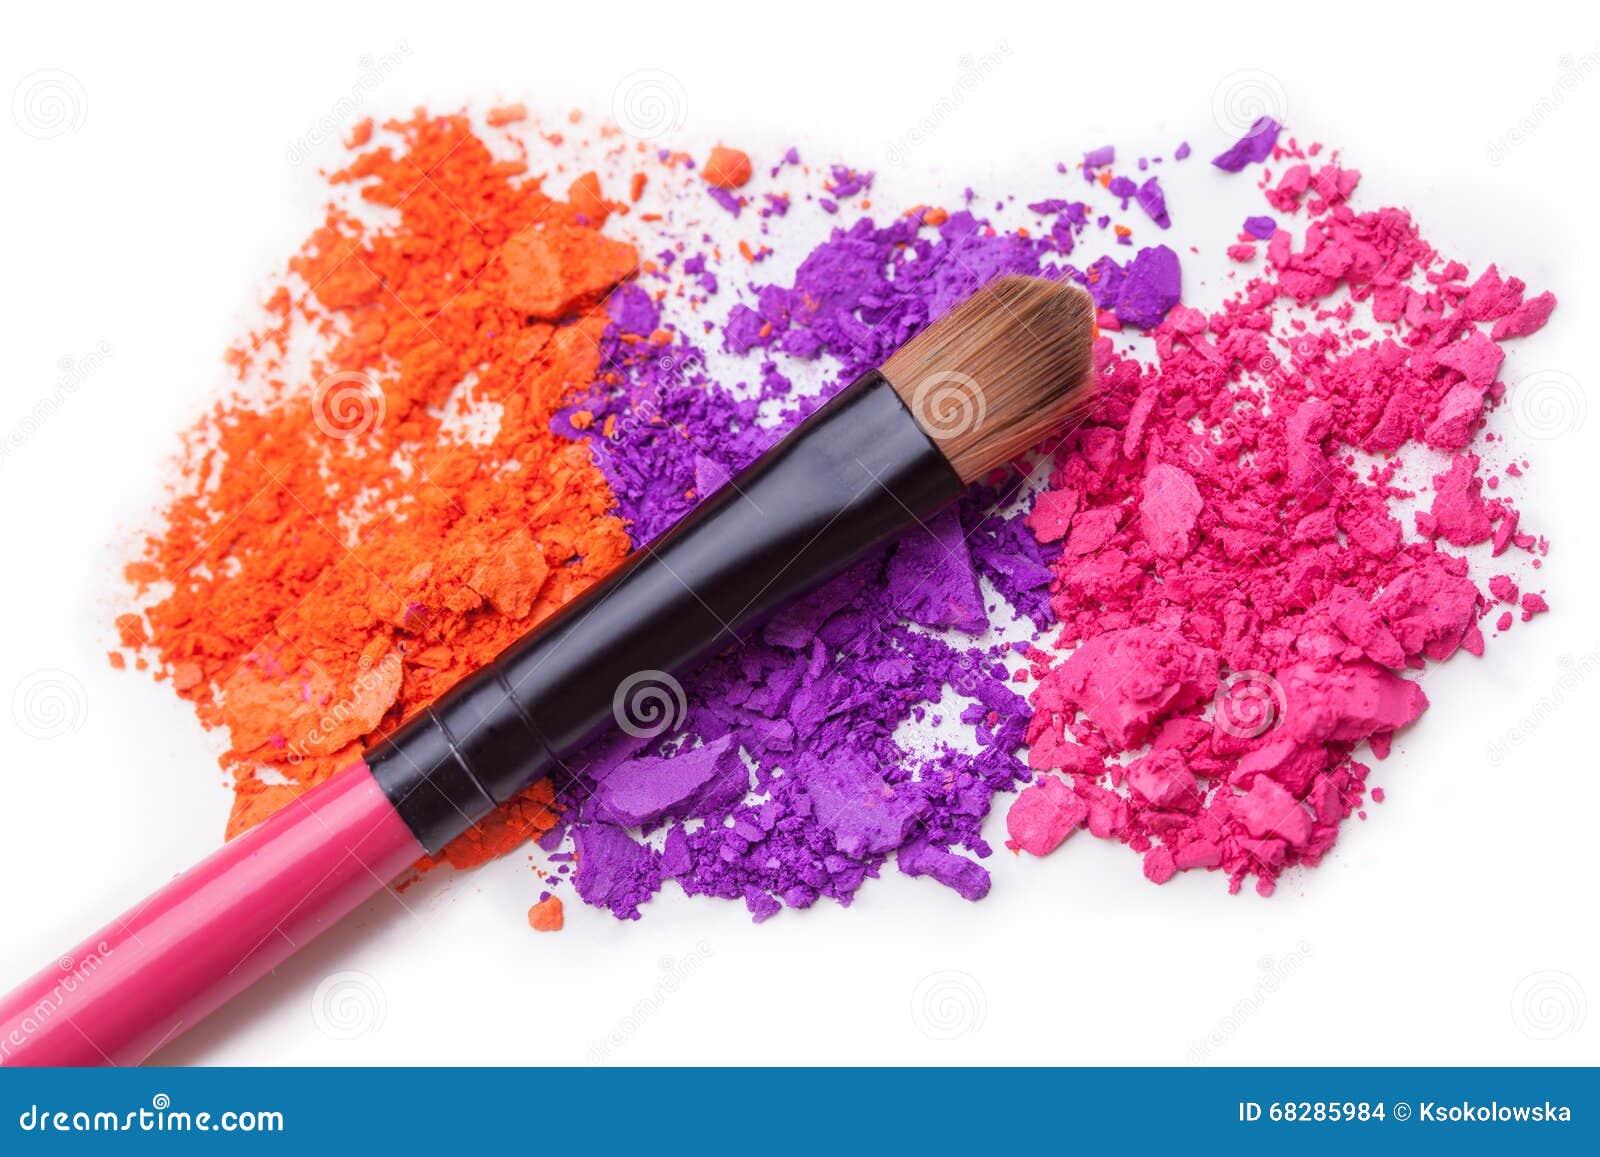 Makeup Shadows And Brush Stock Photo Image Of Brown 68285984